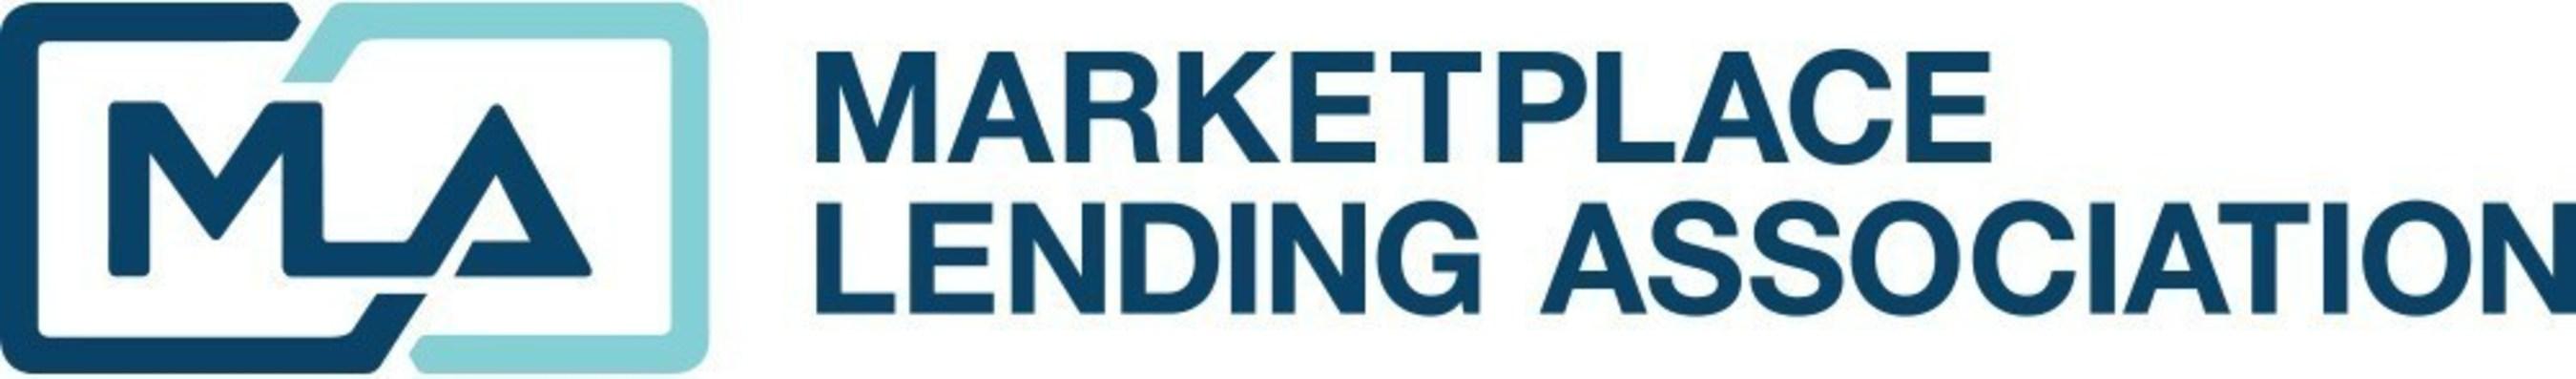 Marketplace Lending Association